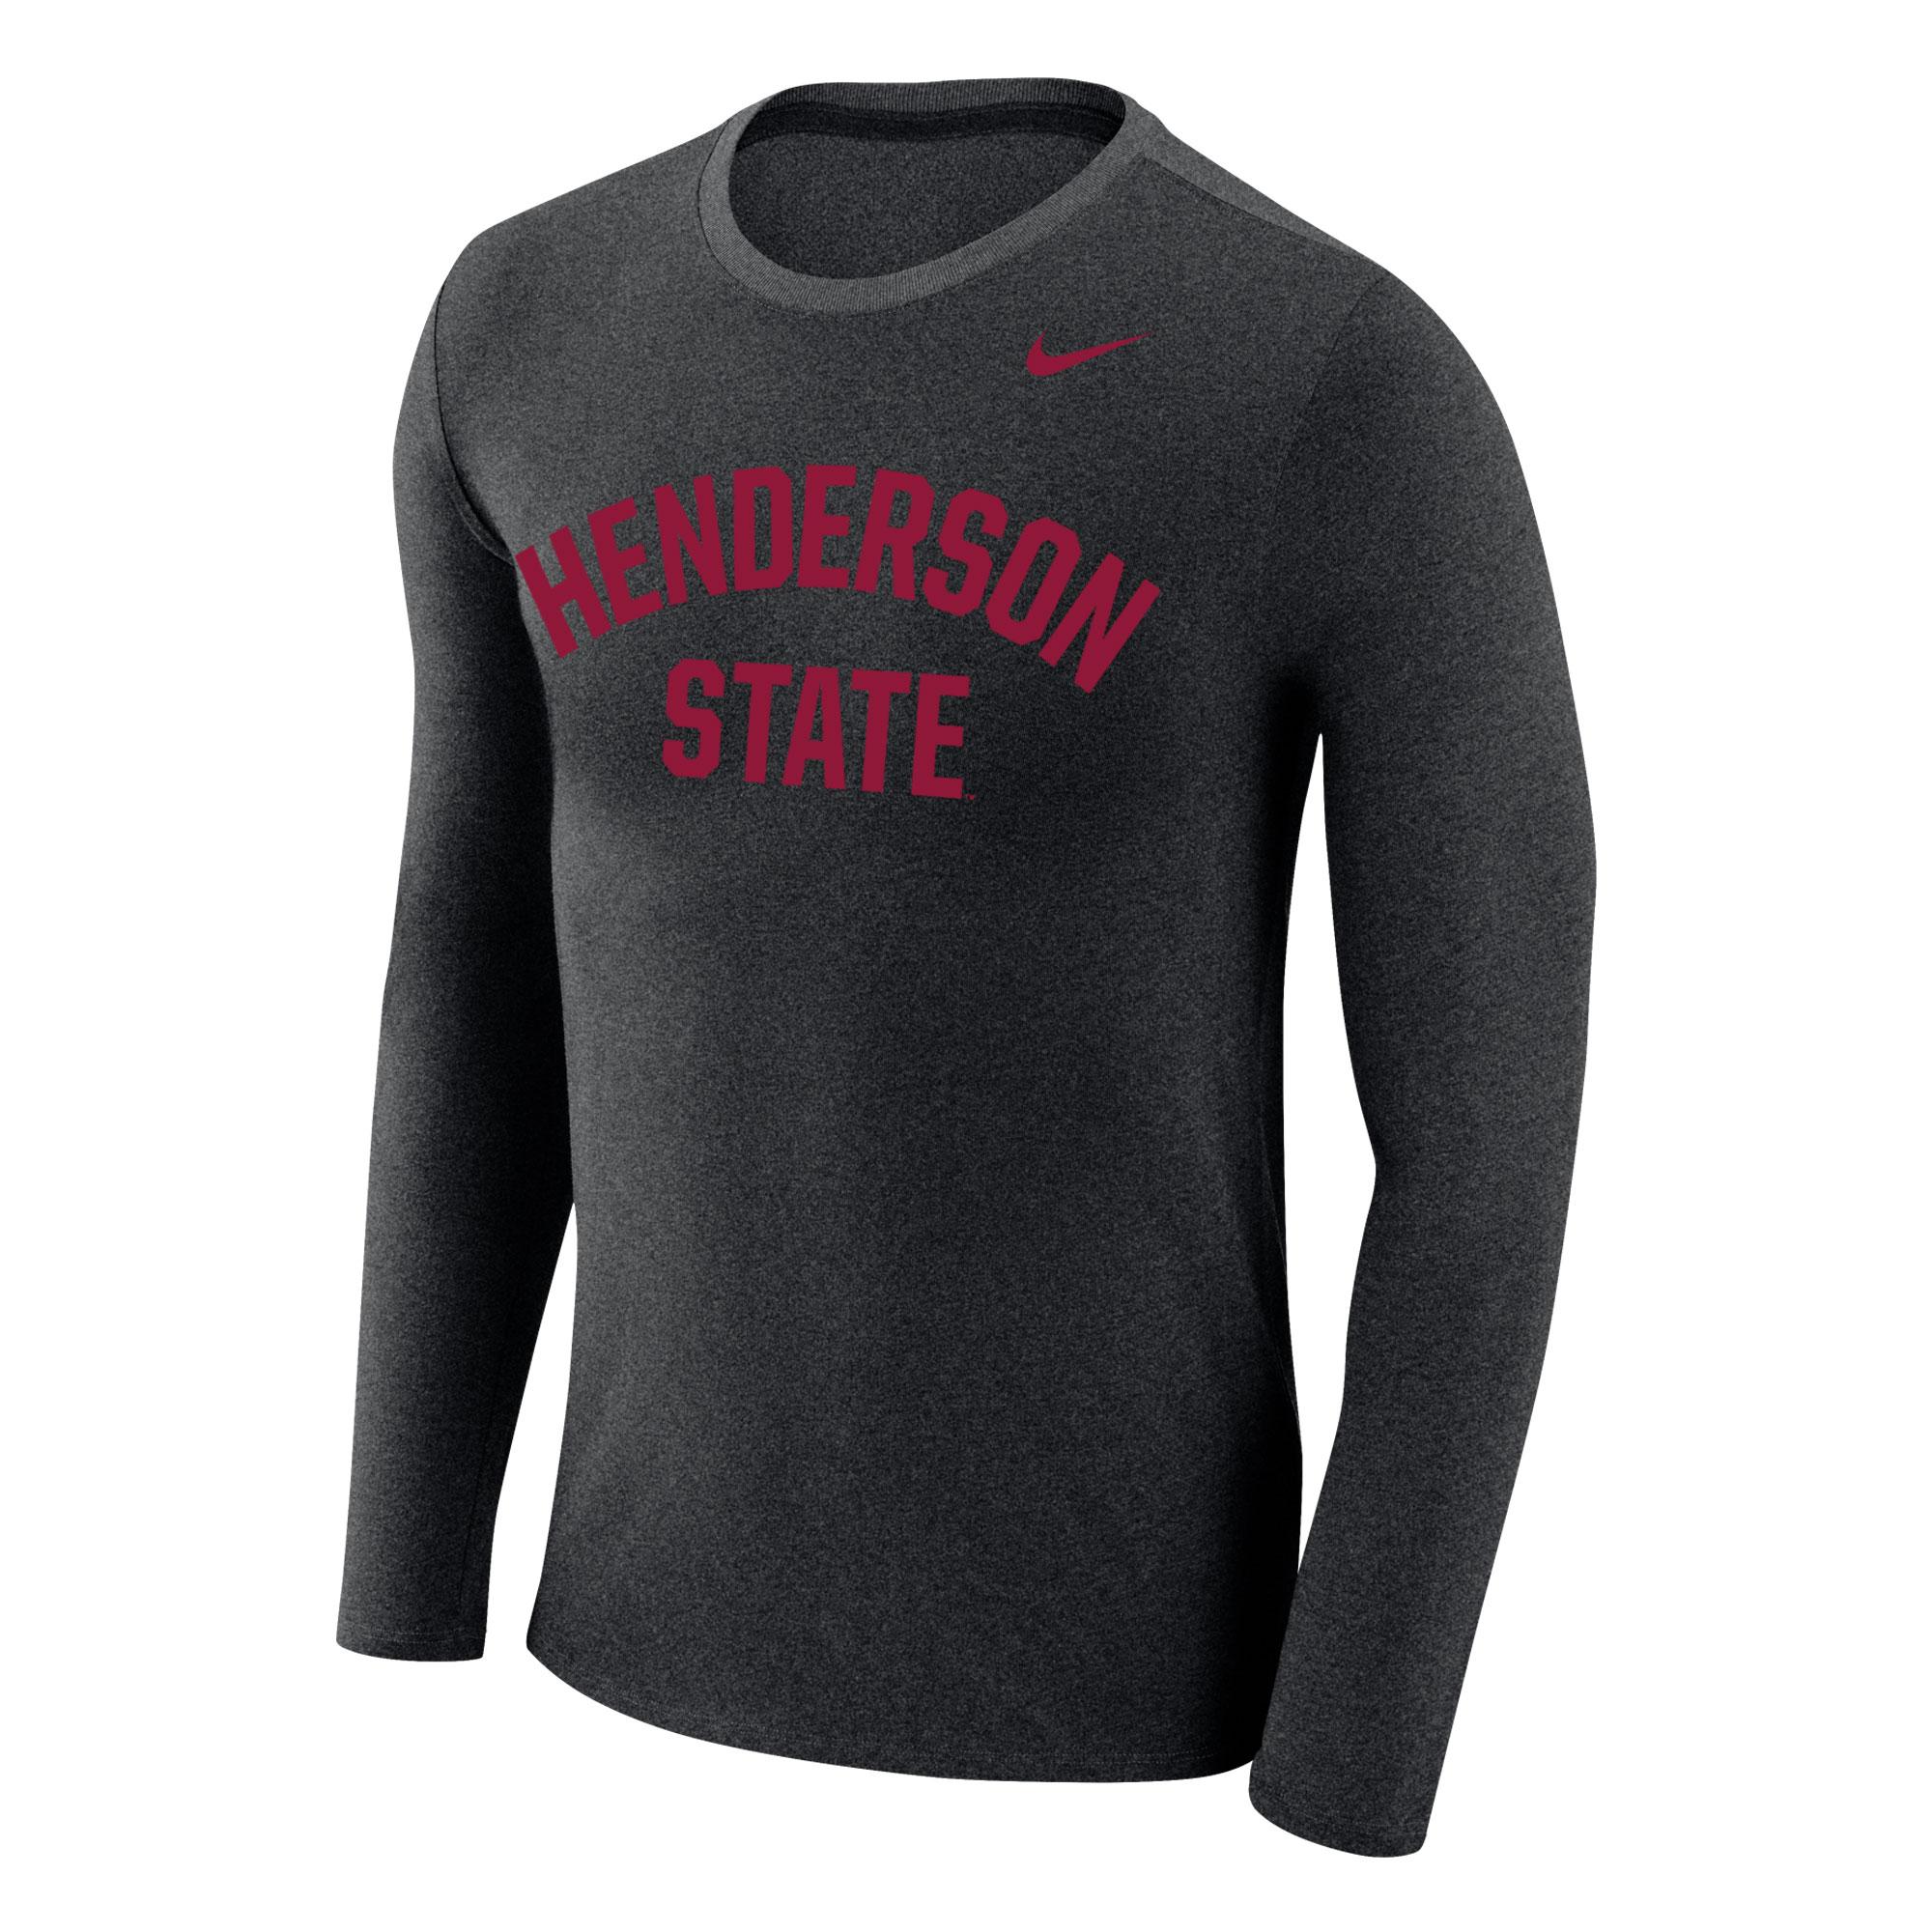 Henderson State Marled LS Tee